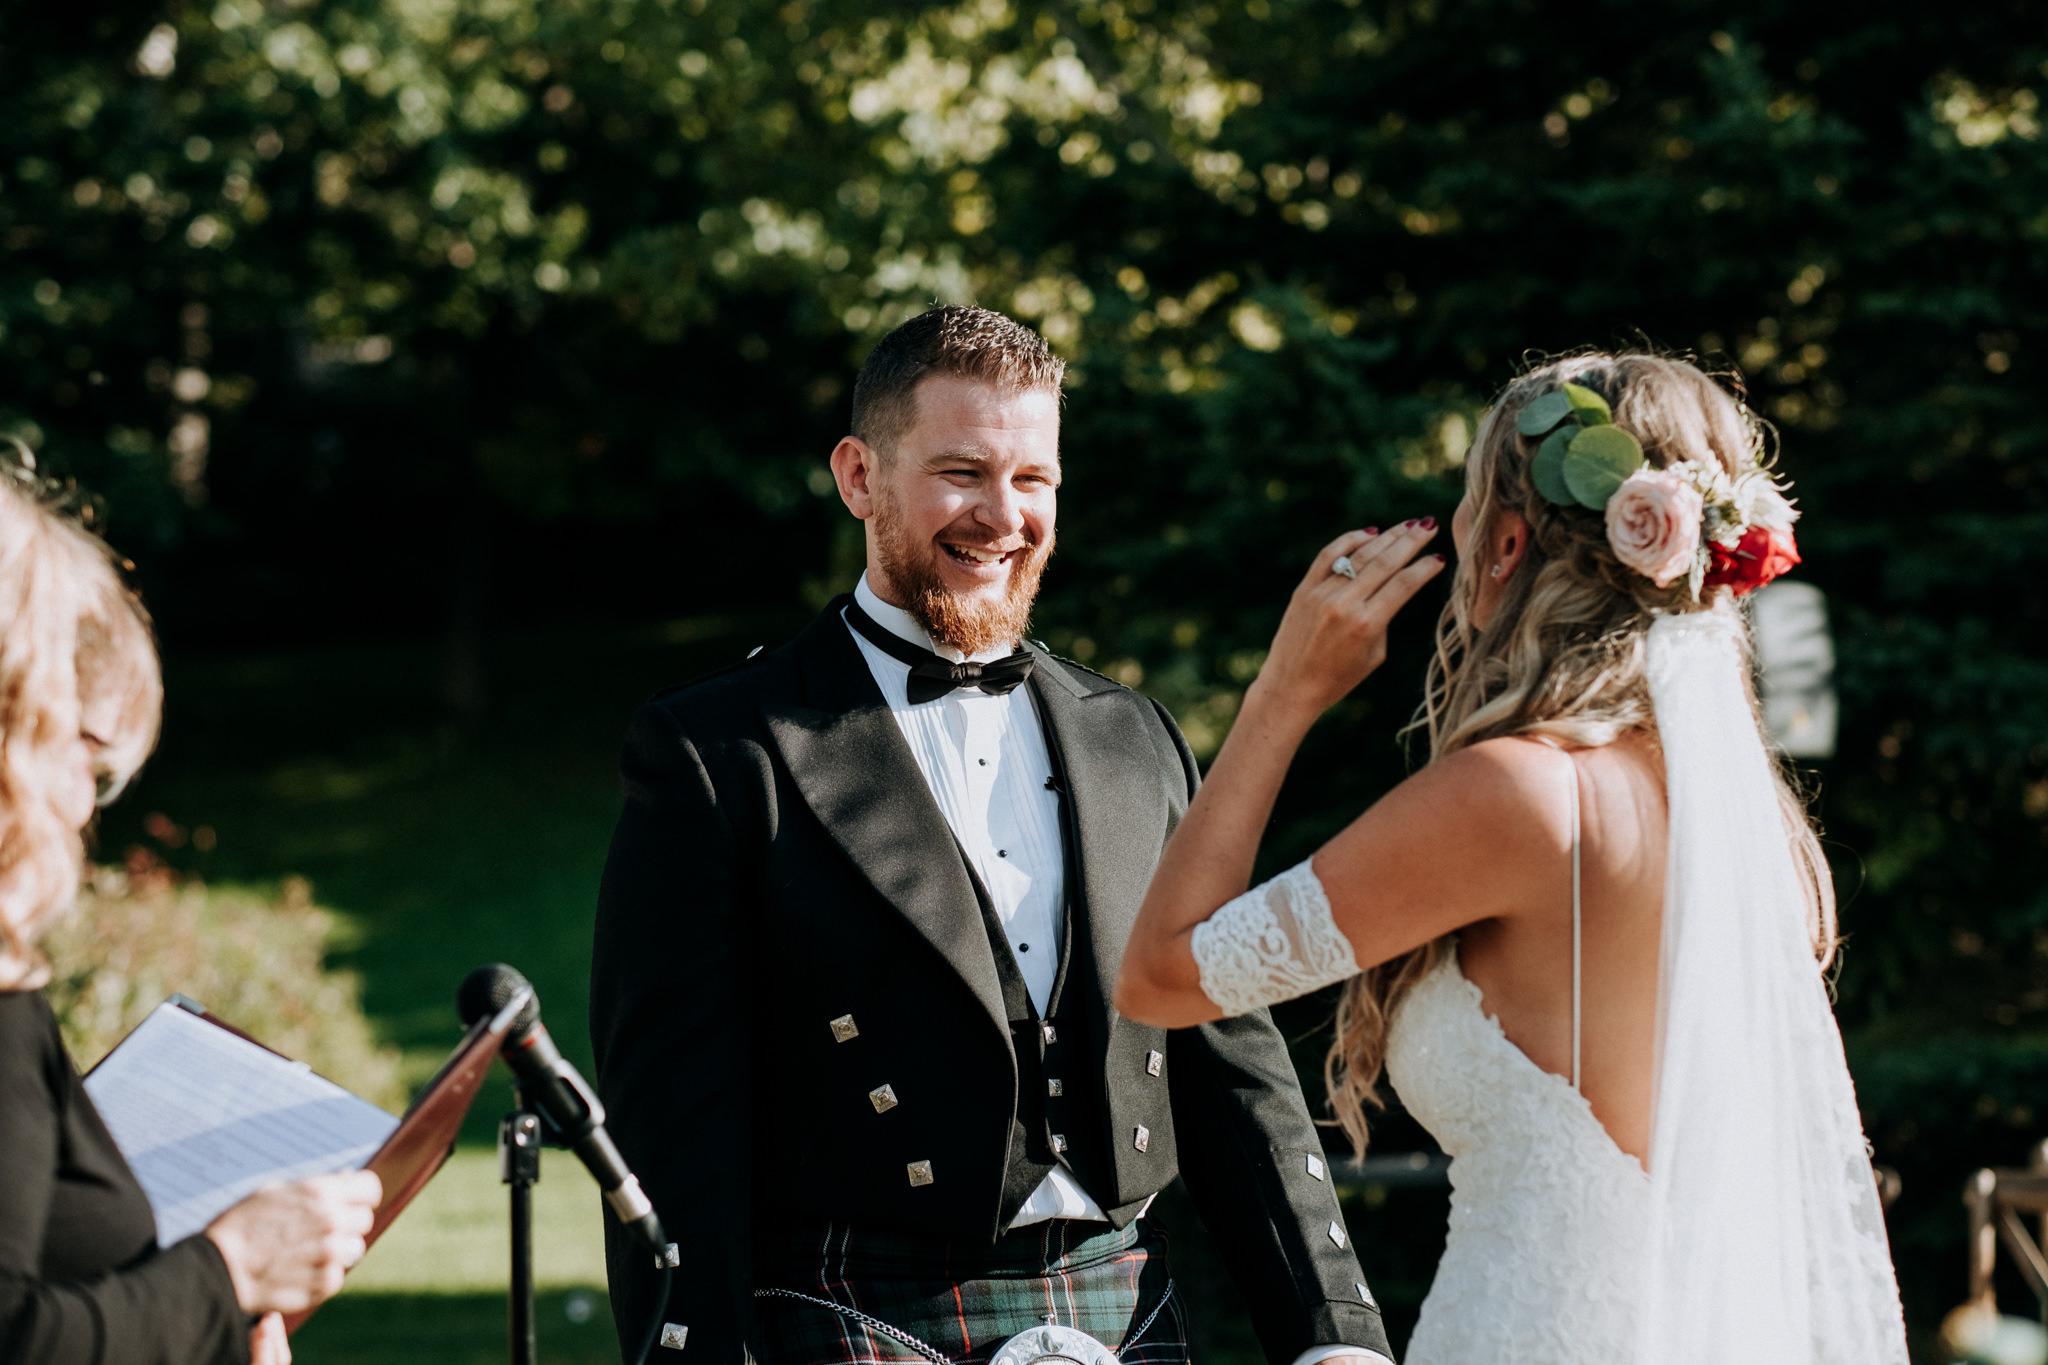 Portage Inn Wedding, Huntsville Wedding Photographer, Best Muskoka Wedding Photographers